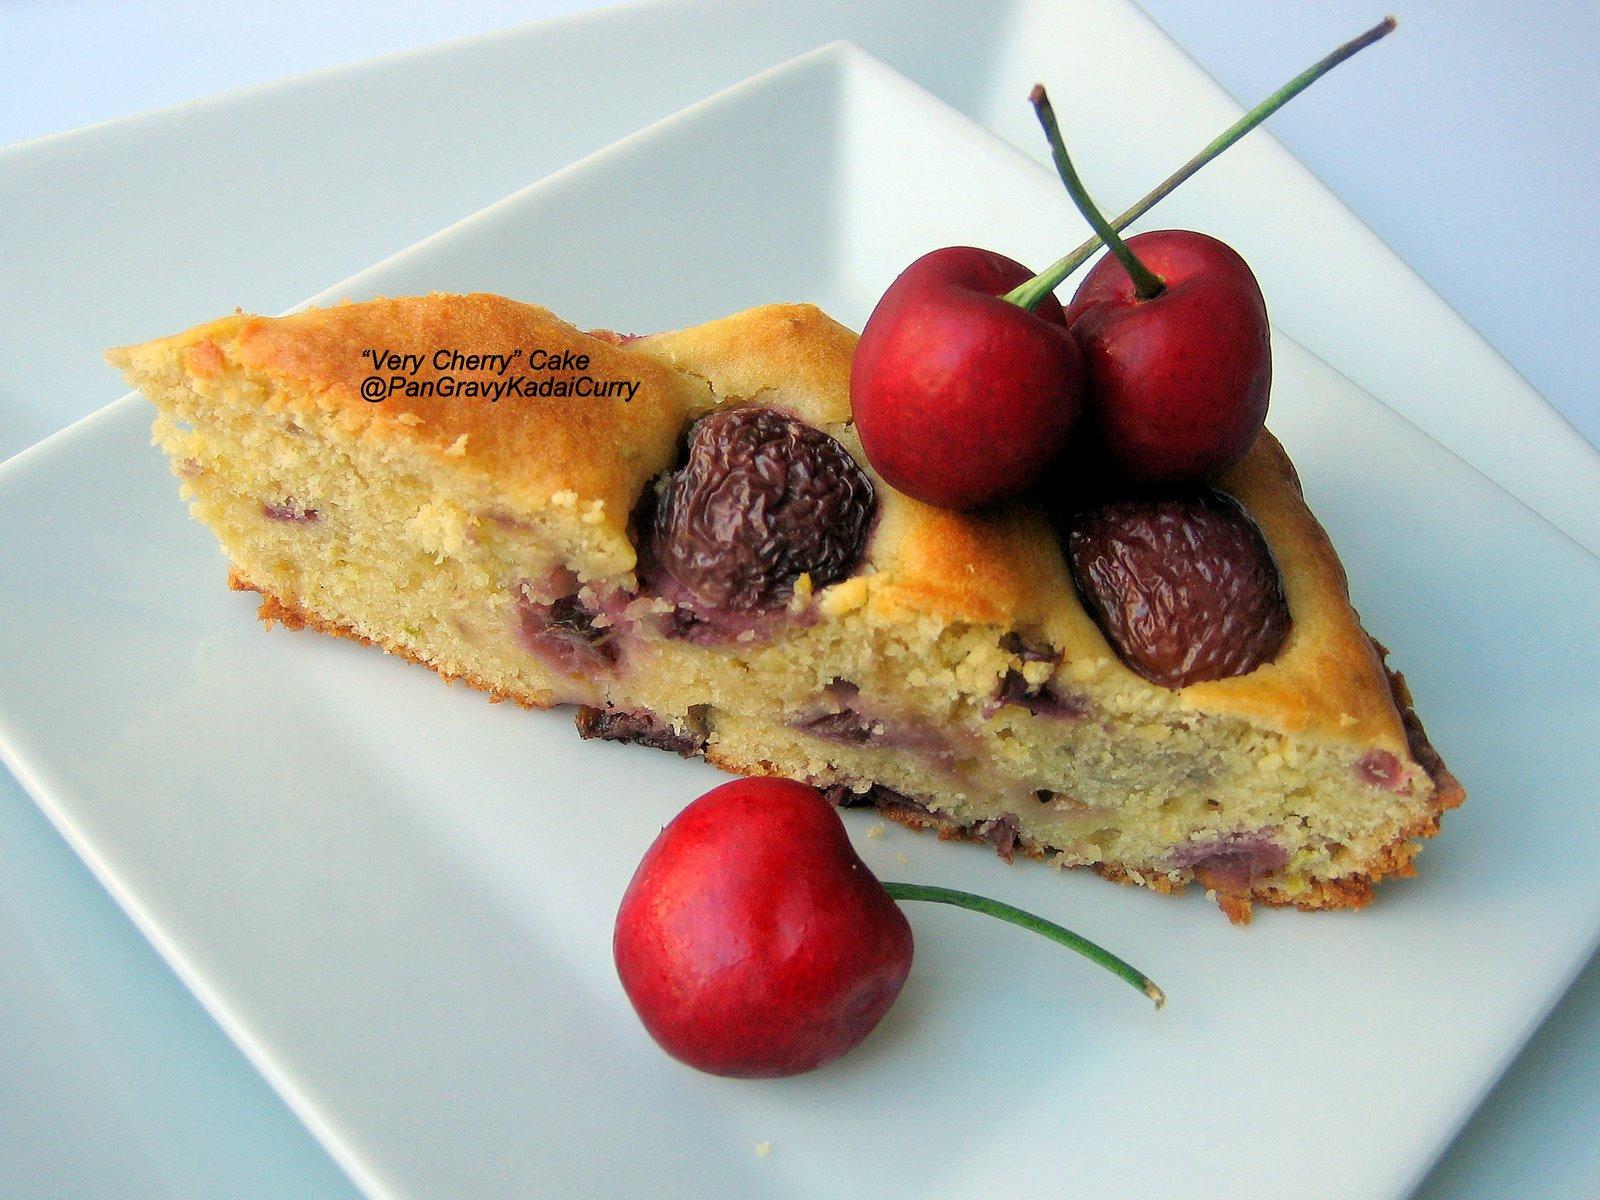 Egg Cake Recipe In Kadai: Pan Gravy Kadai Curry: RecipeReplica: Cherry-Cherry Cake